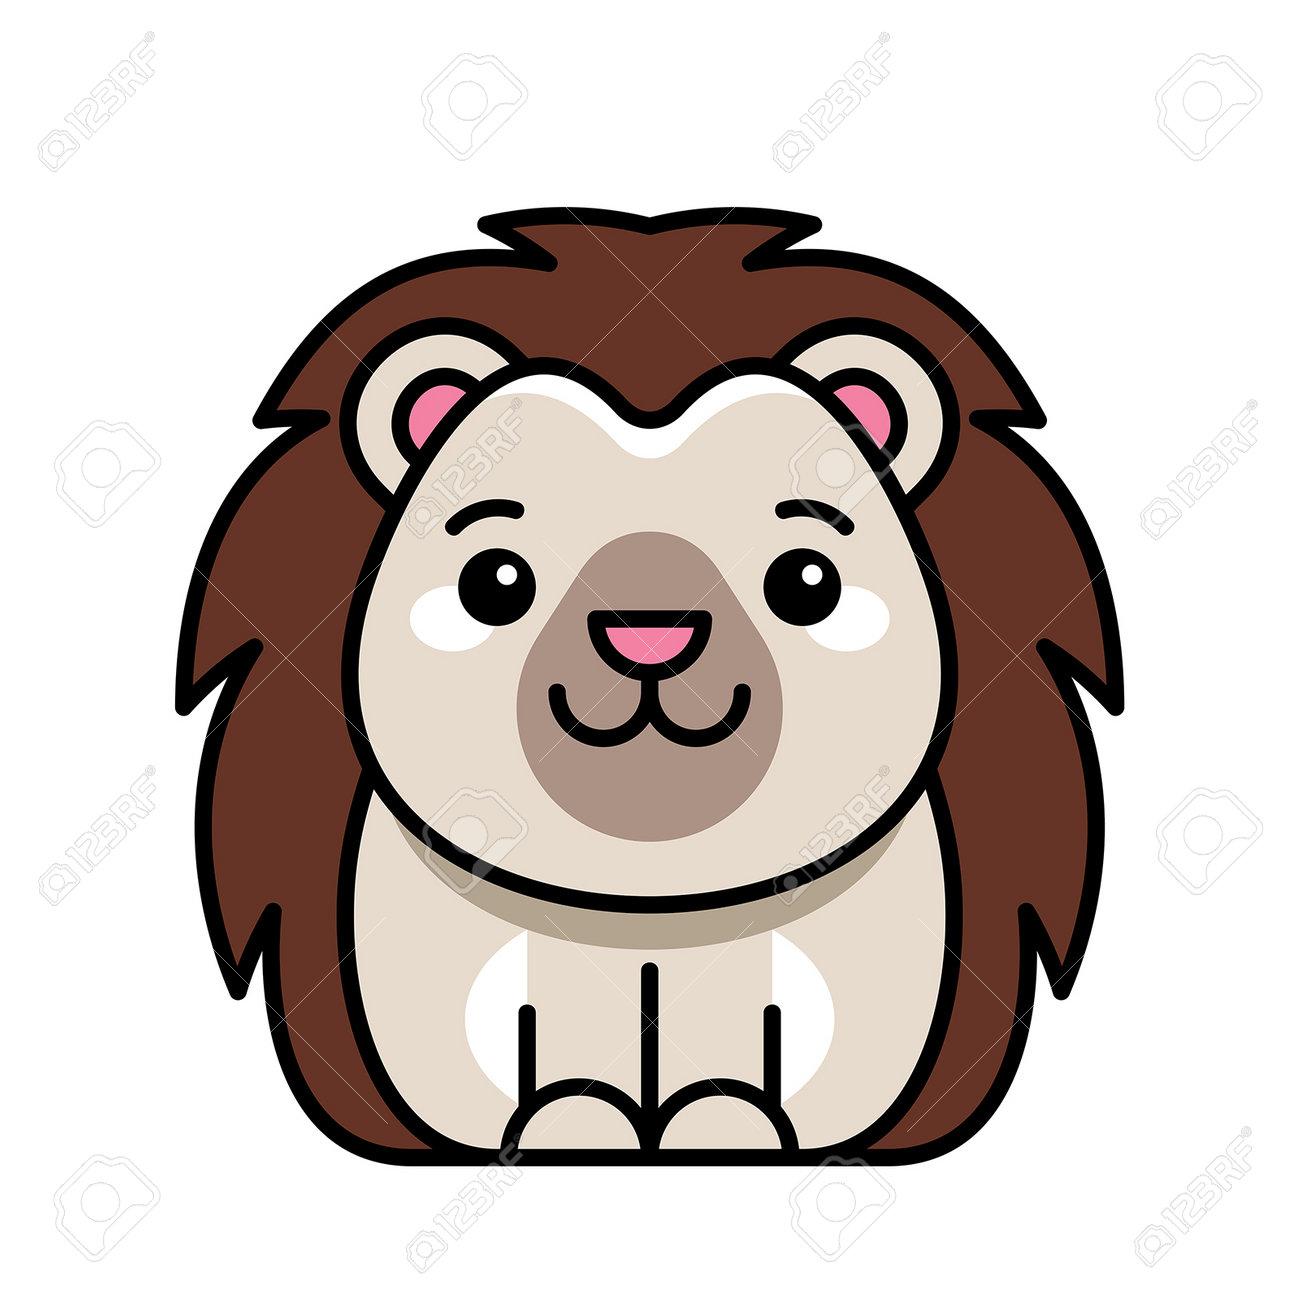 Hedgehog icon. Icon design. Template elements - 171231697